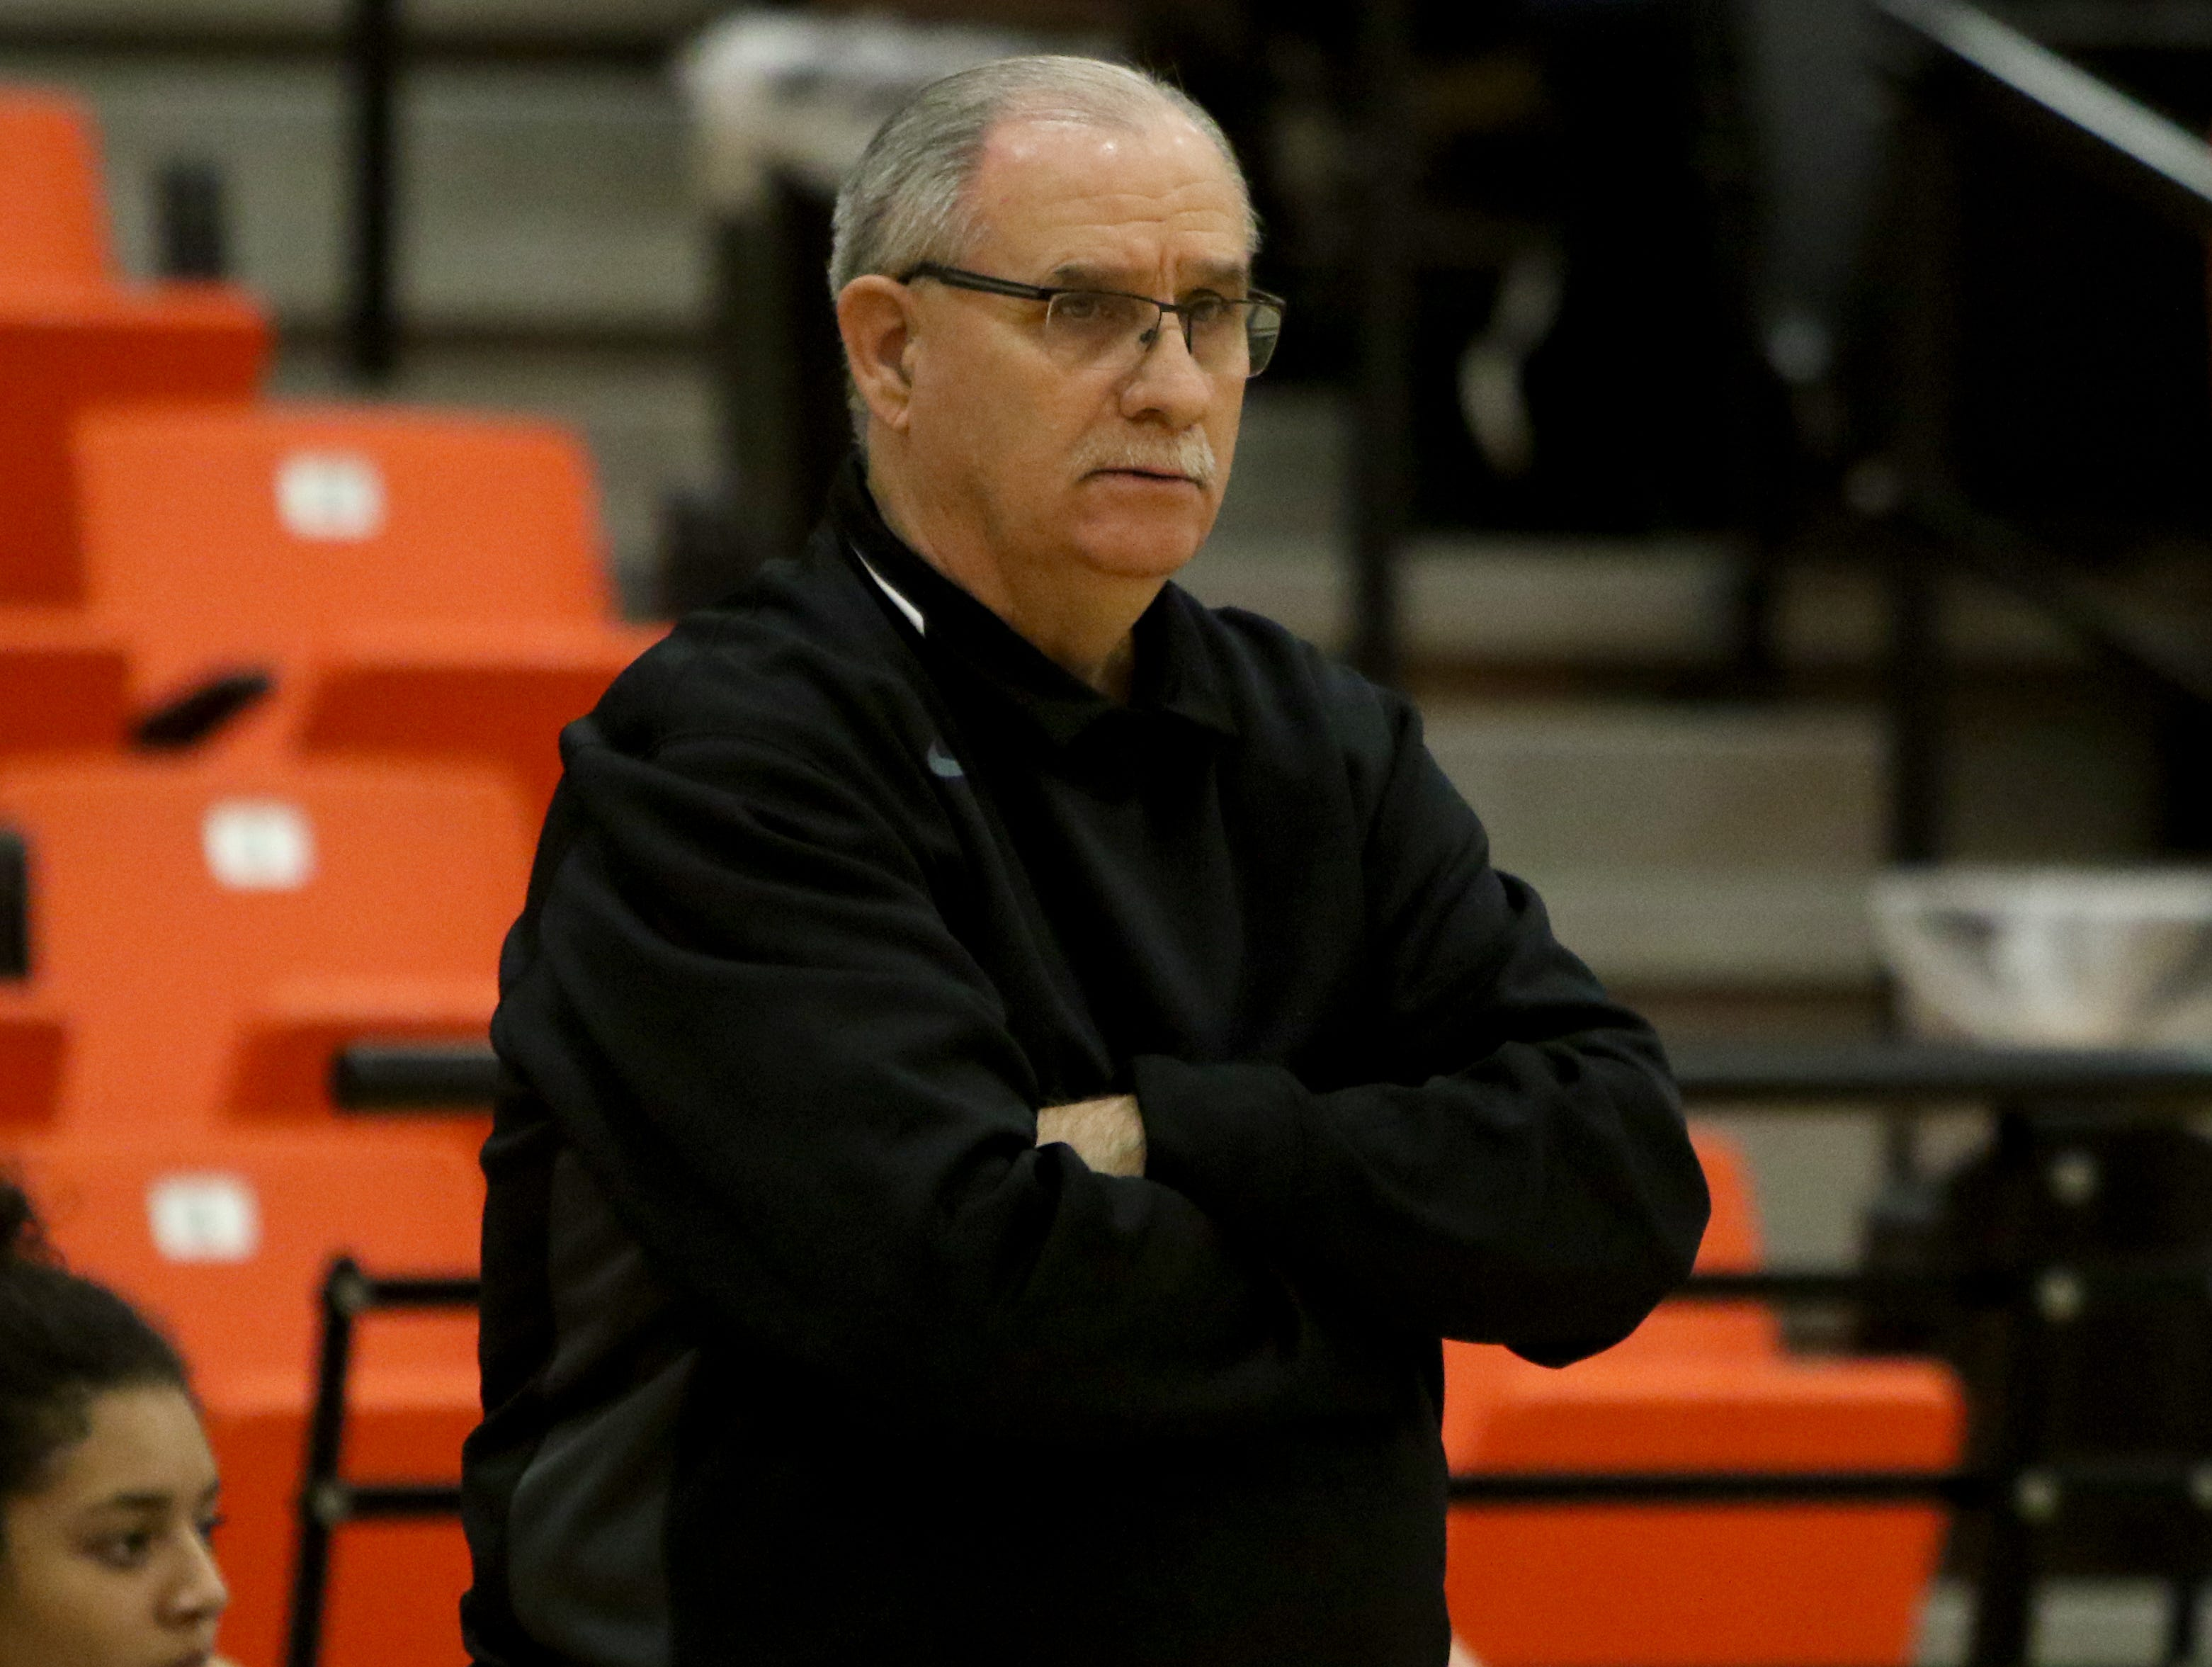 Burkburnett head basketball coach Alex Koulovatos watches his team in the game against Nocona Tuesday, Dec. 4, 2018, in Burkburnett.